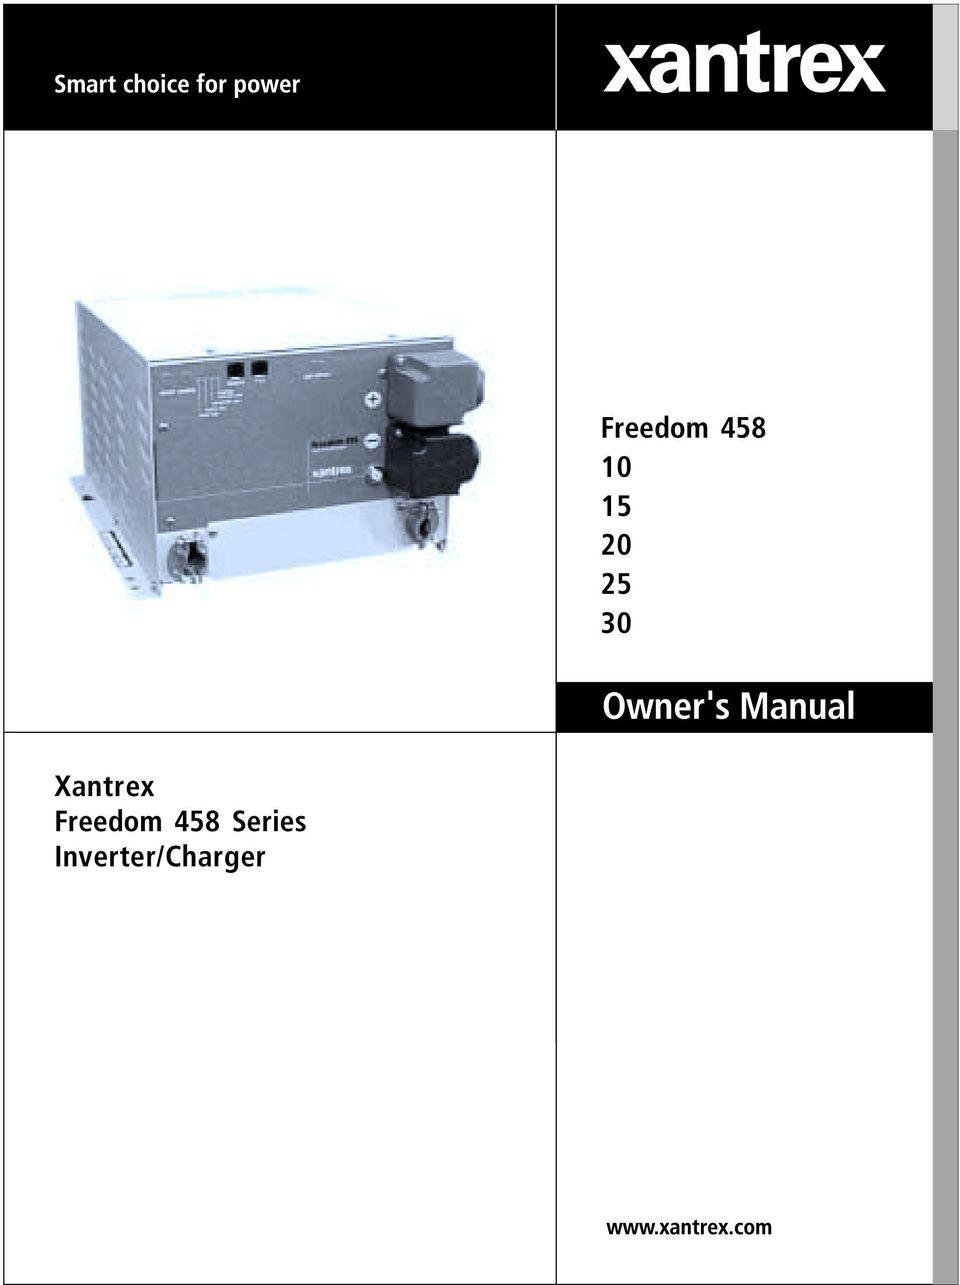 medium resolution of xantrex freedom 458